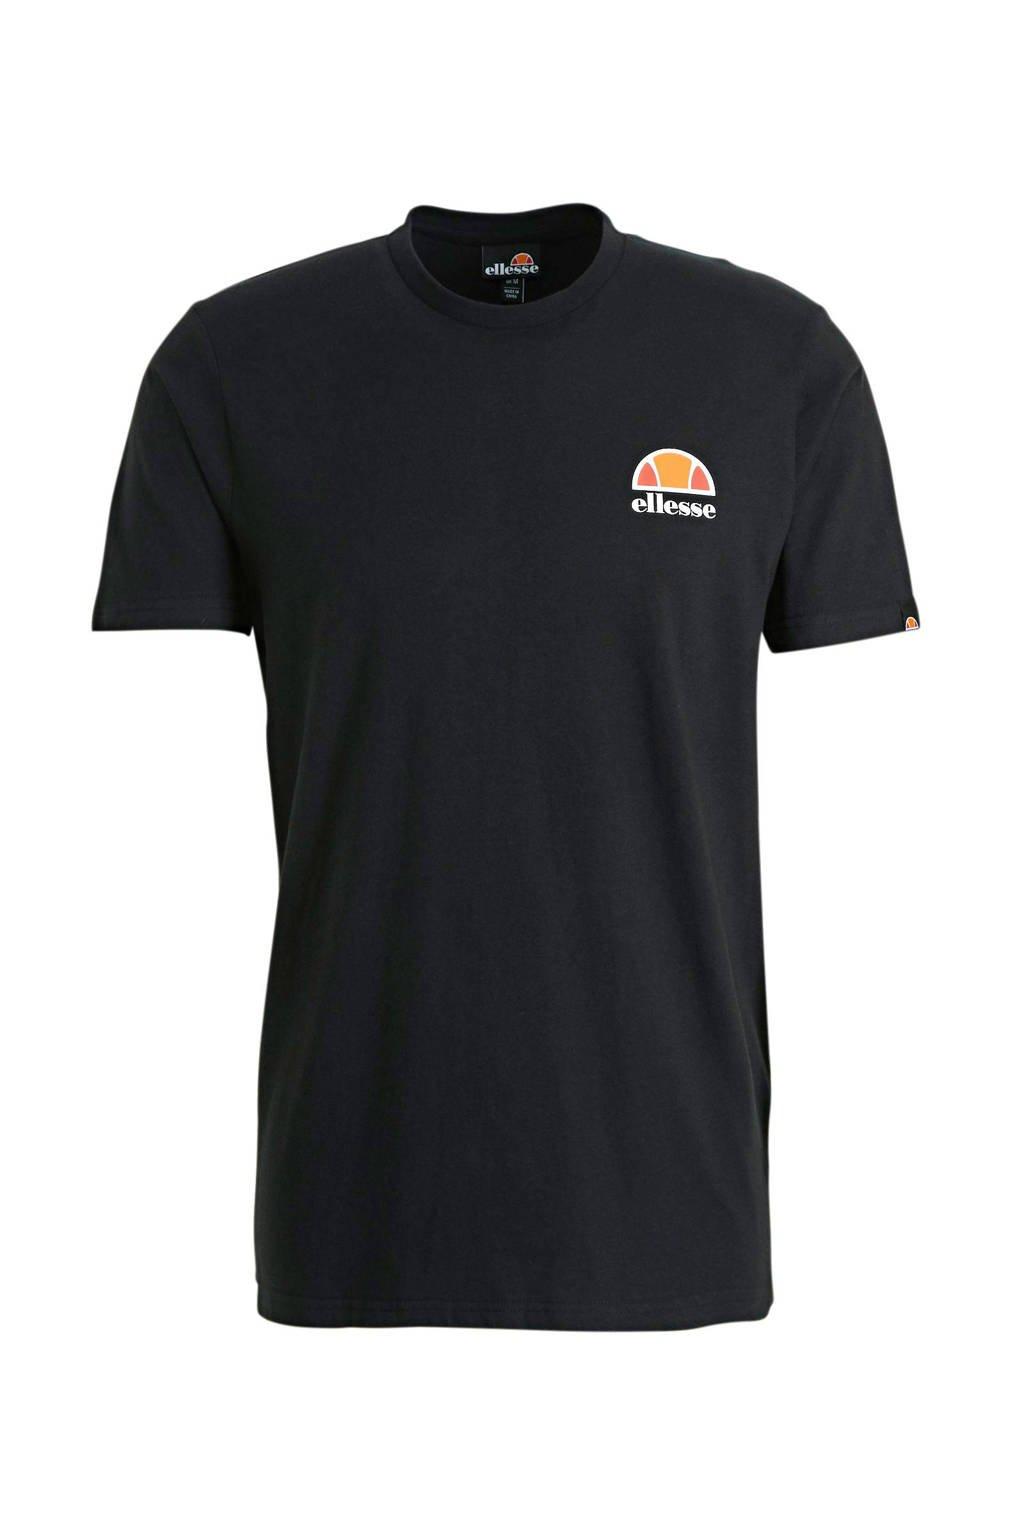 Ellesse T-shirt antraciet, Antraciet